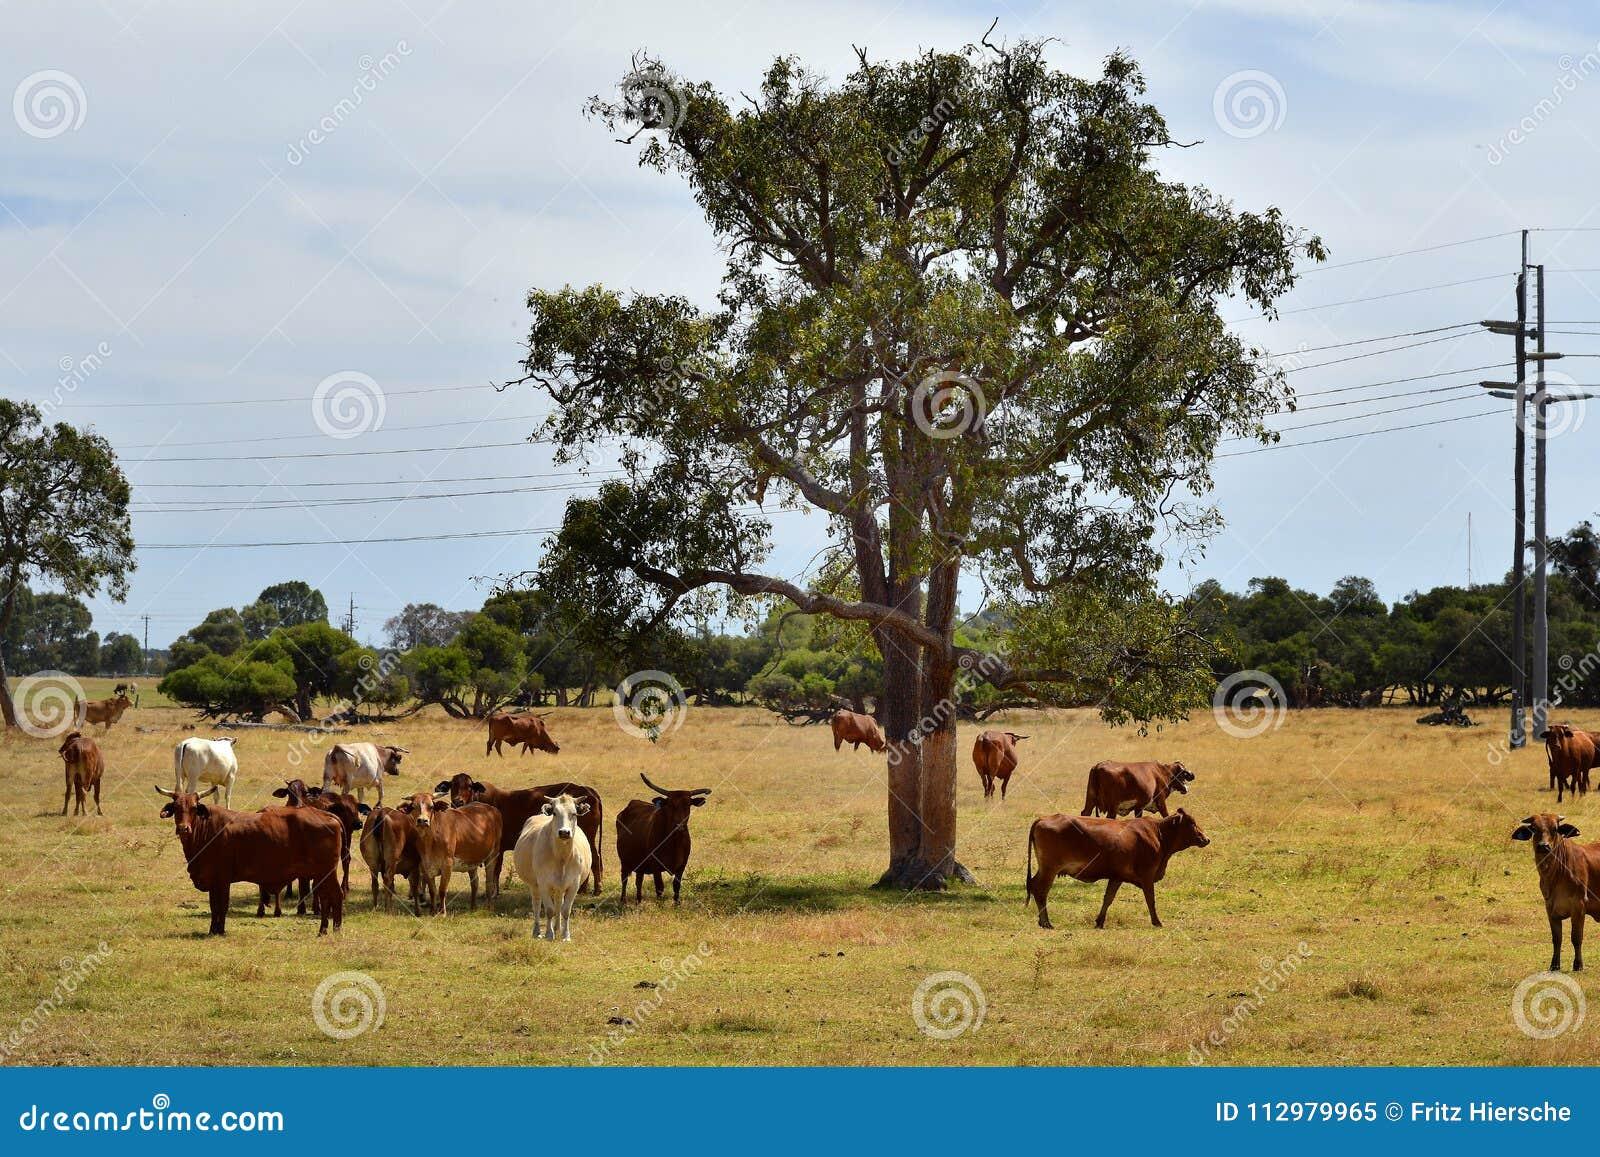 Australia, Western Australia, livestock